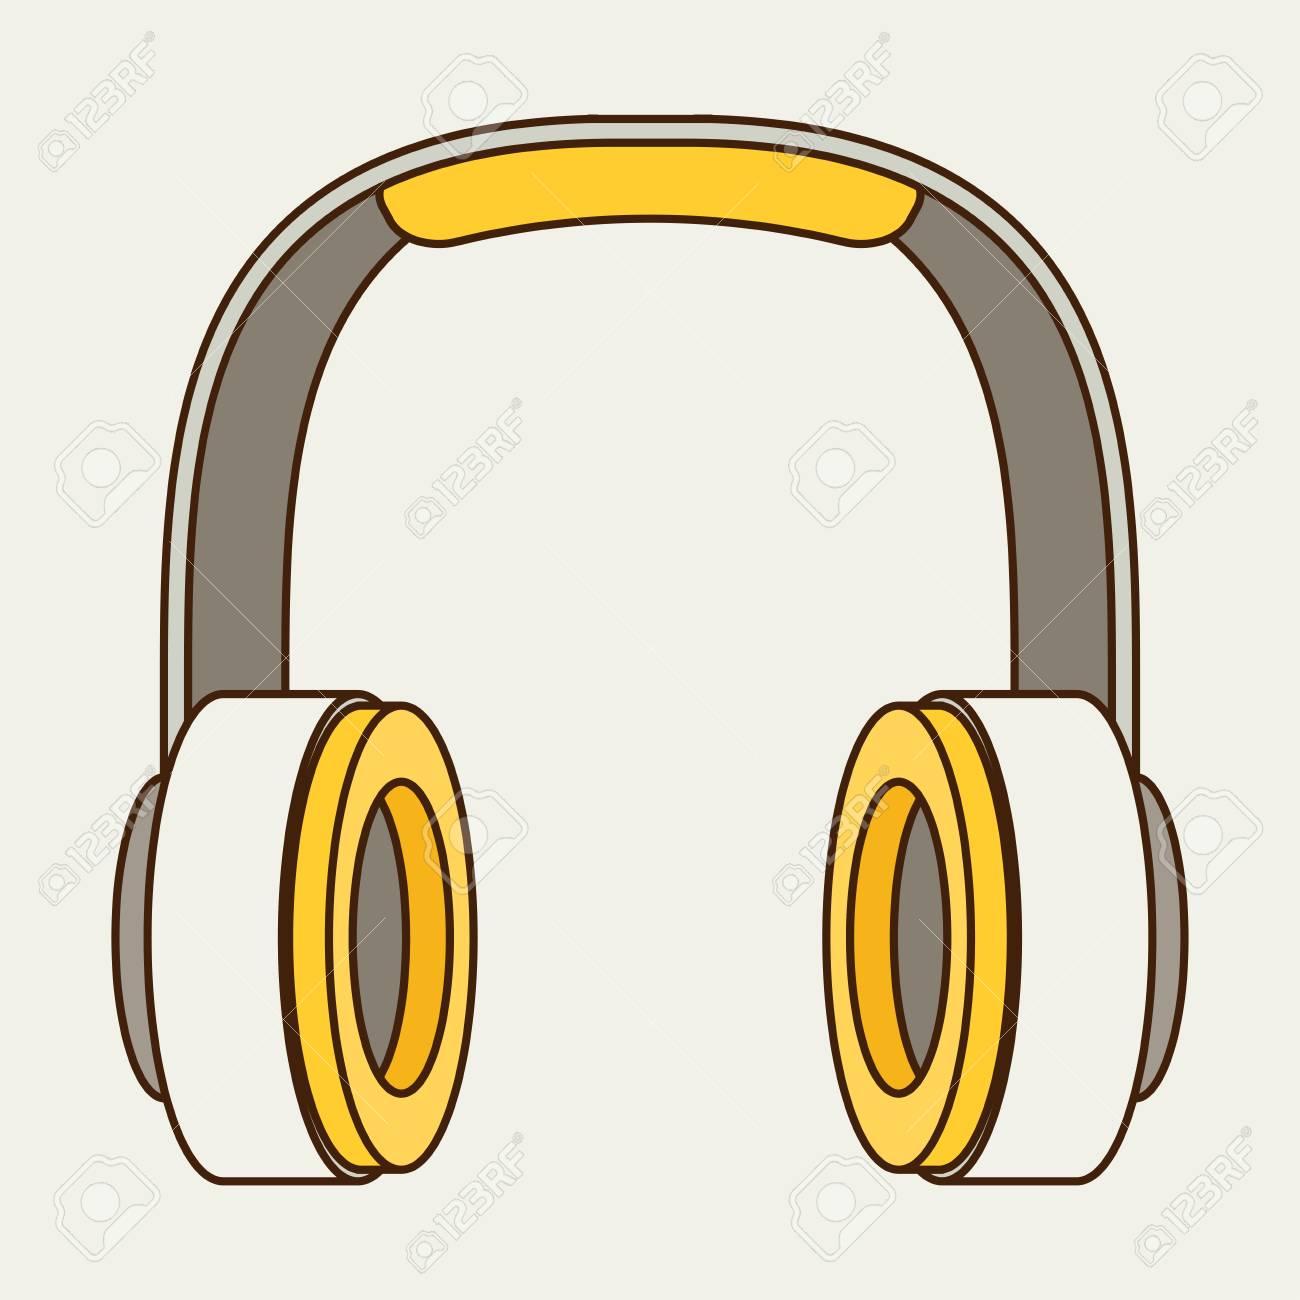 Vektor-Kopfhörer-Symbol Lizenzfrei Nutzbare Vektorgrafiken, Clip ...